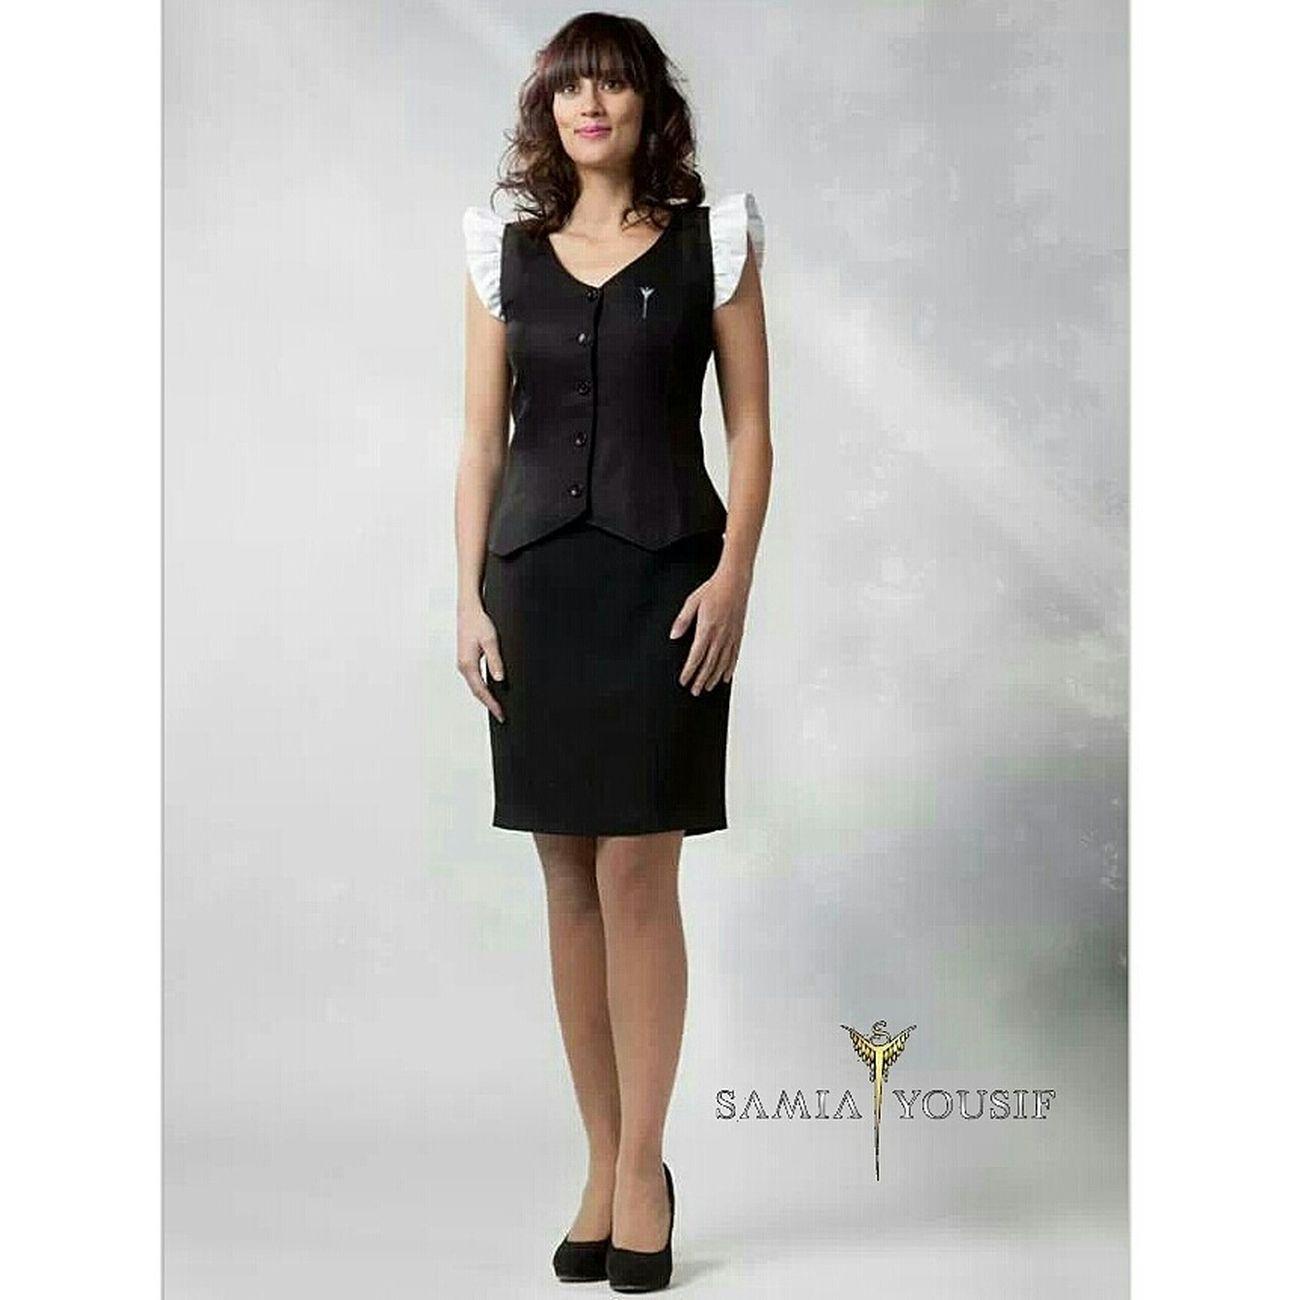 Fashiondiaries Fashiondesign Fashion Fashion&love&beauty Ootd